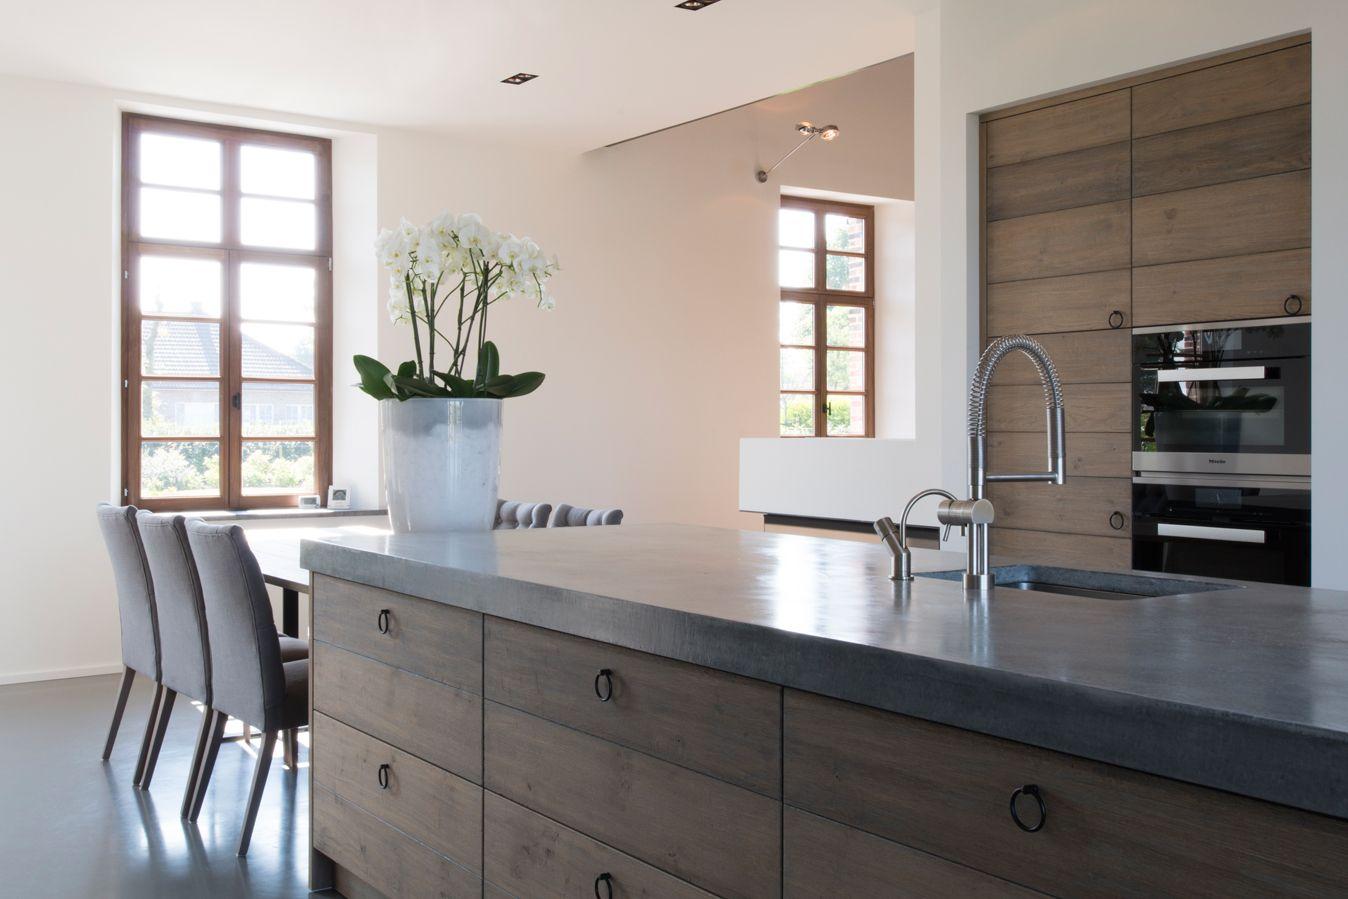 Moderne keuken in strakke loft tinello home keuken keuken